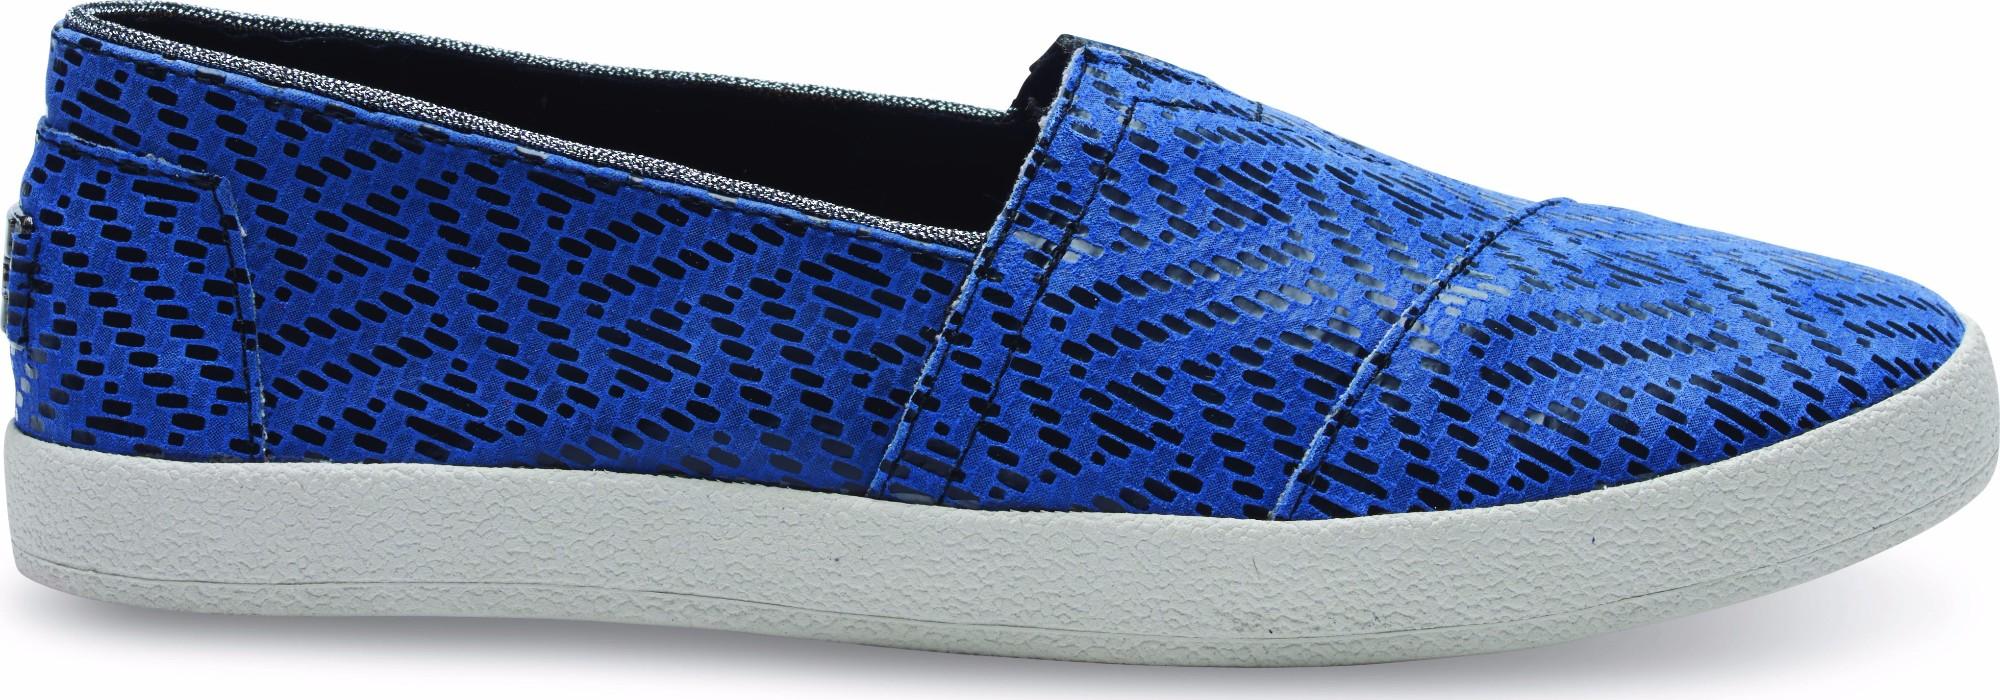 TOMS Leather Reptile Women's Avalon Sneaker Blue 38